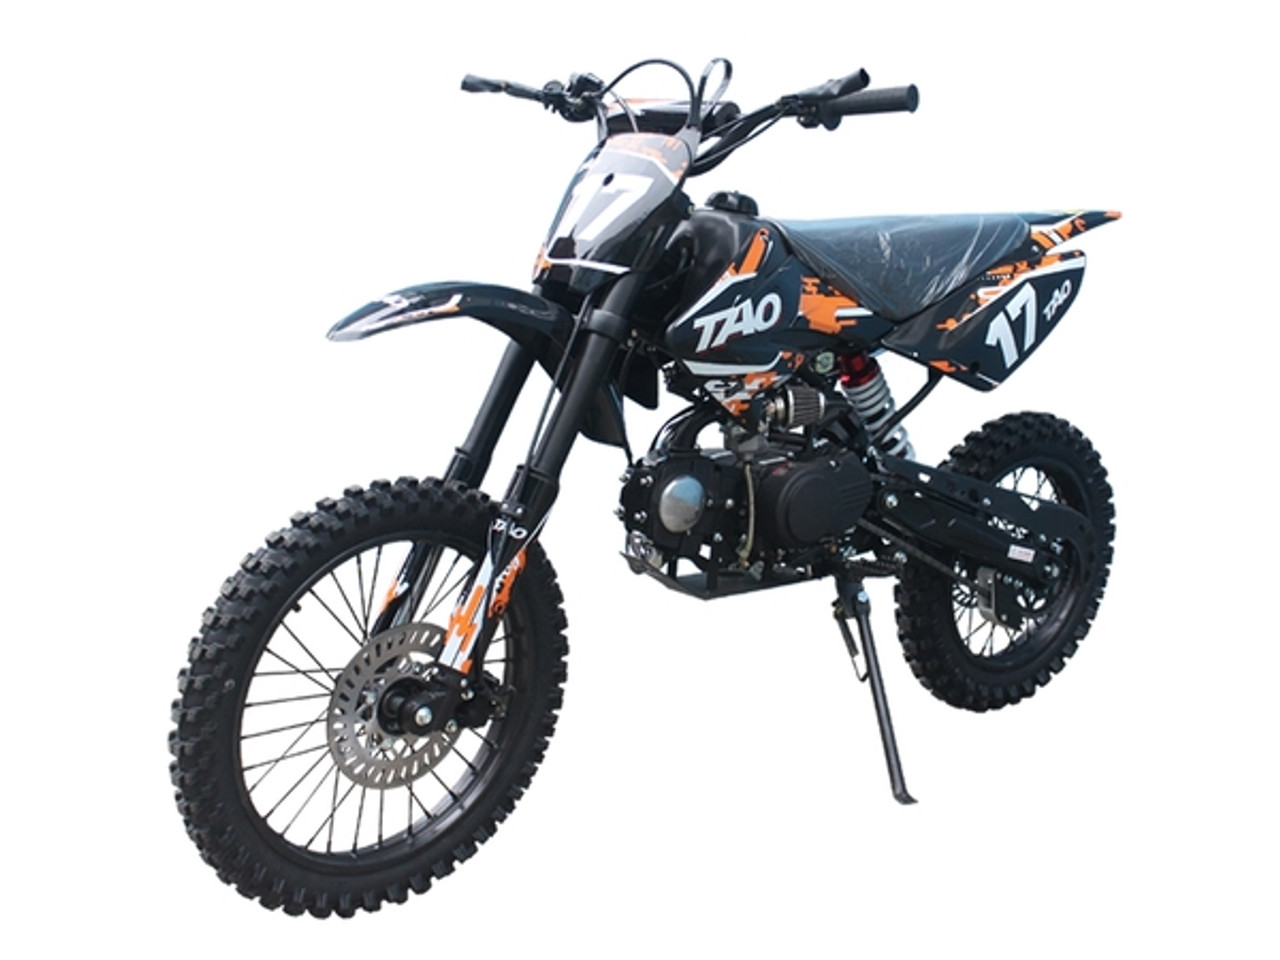 Taotao High End Dirt Bike 17 125CC For Sale